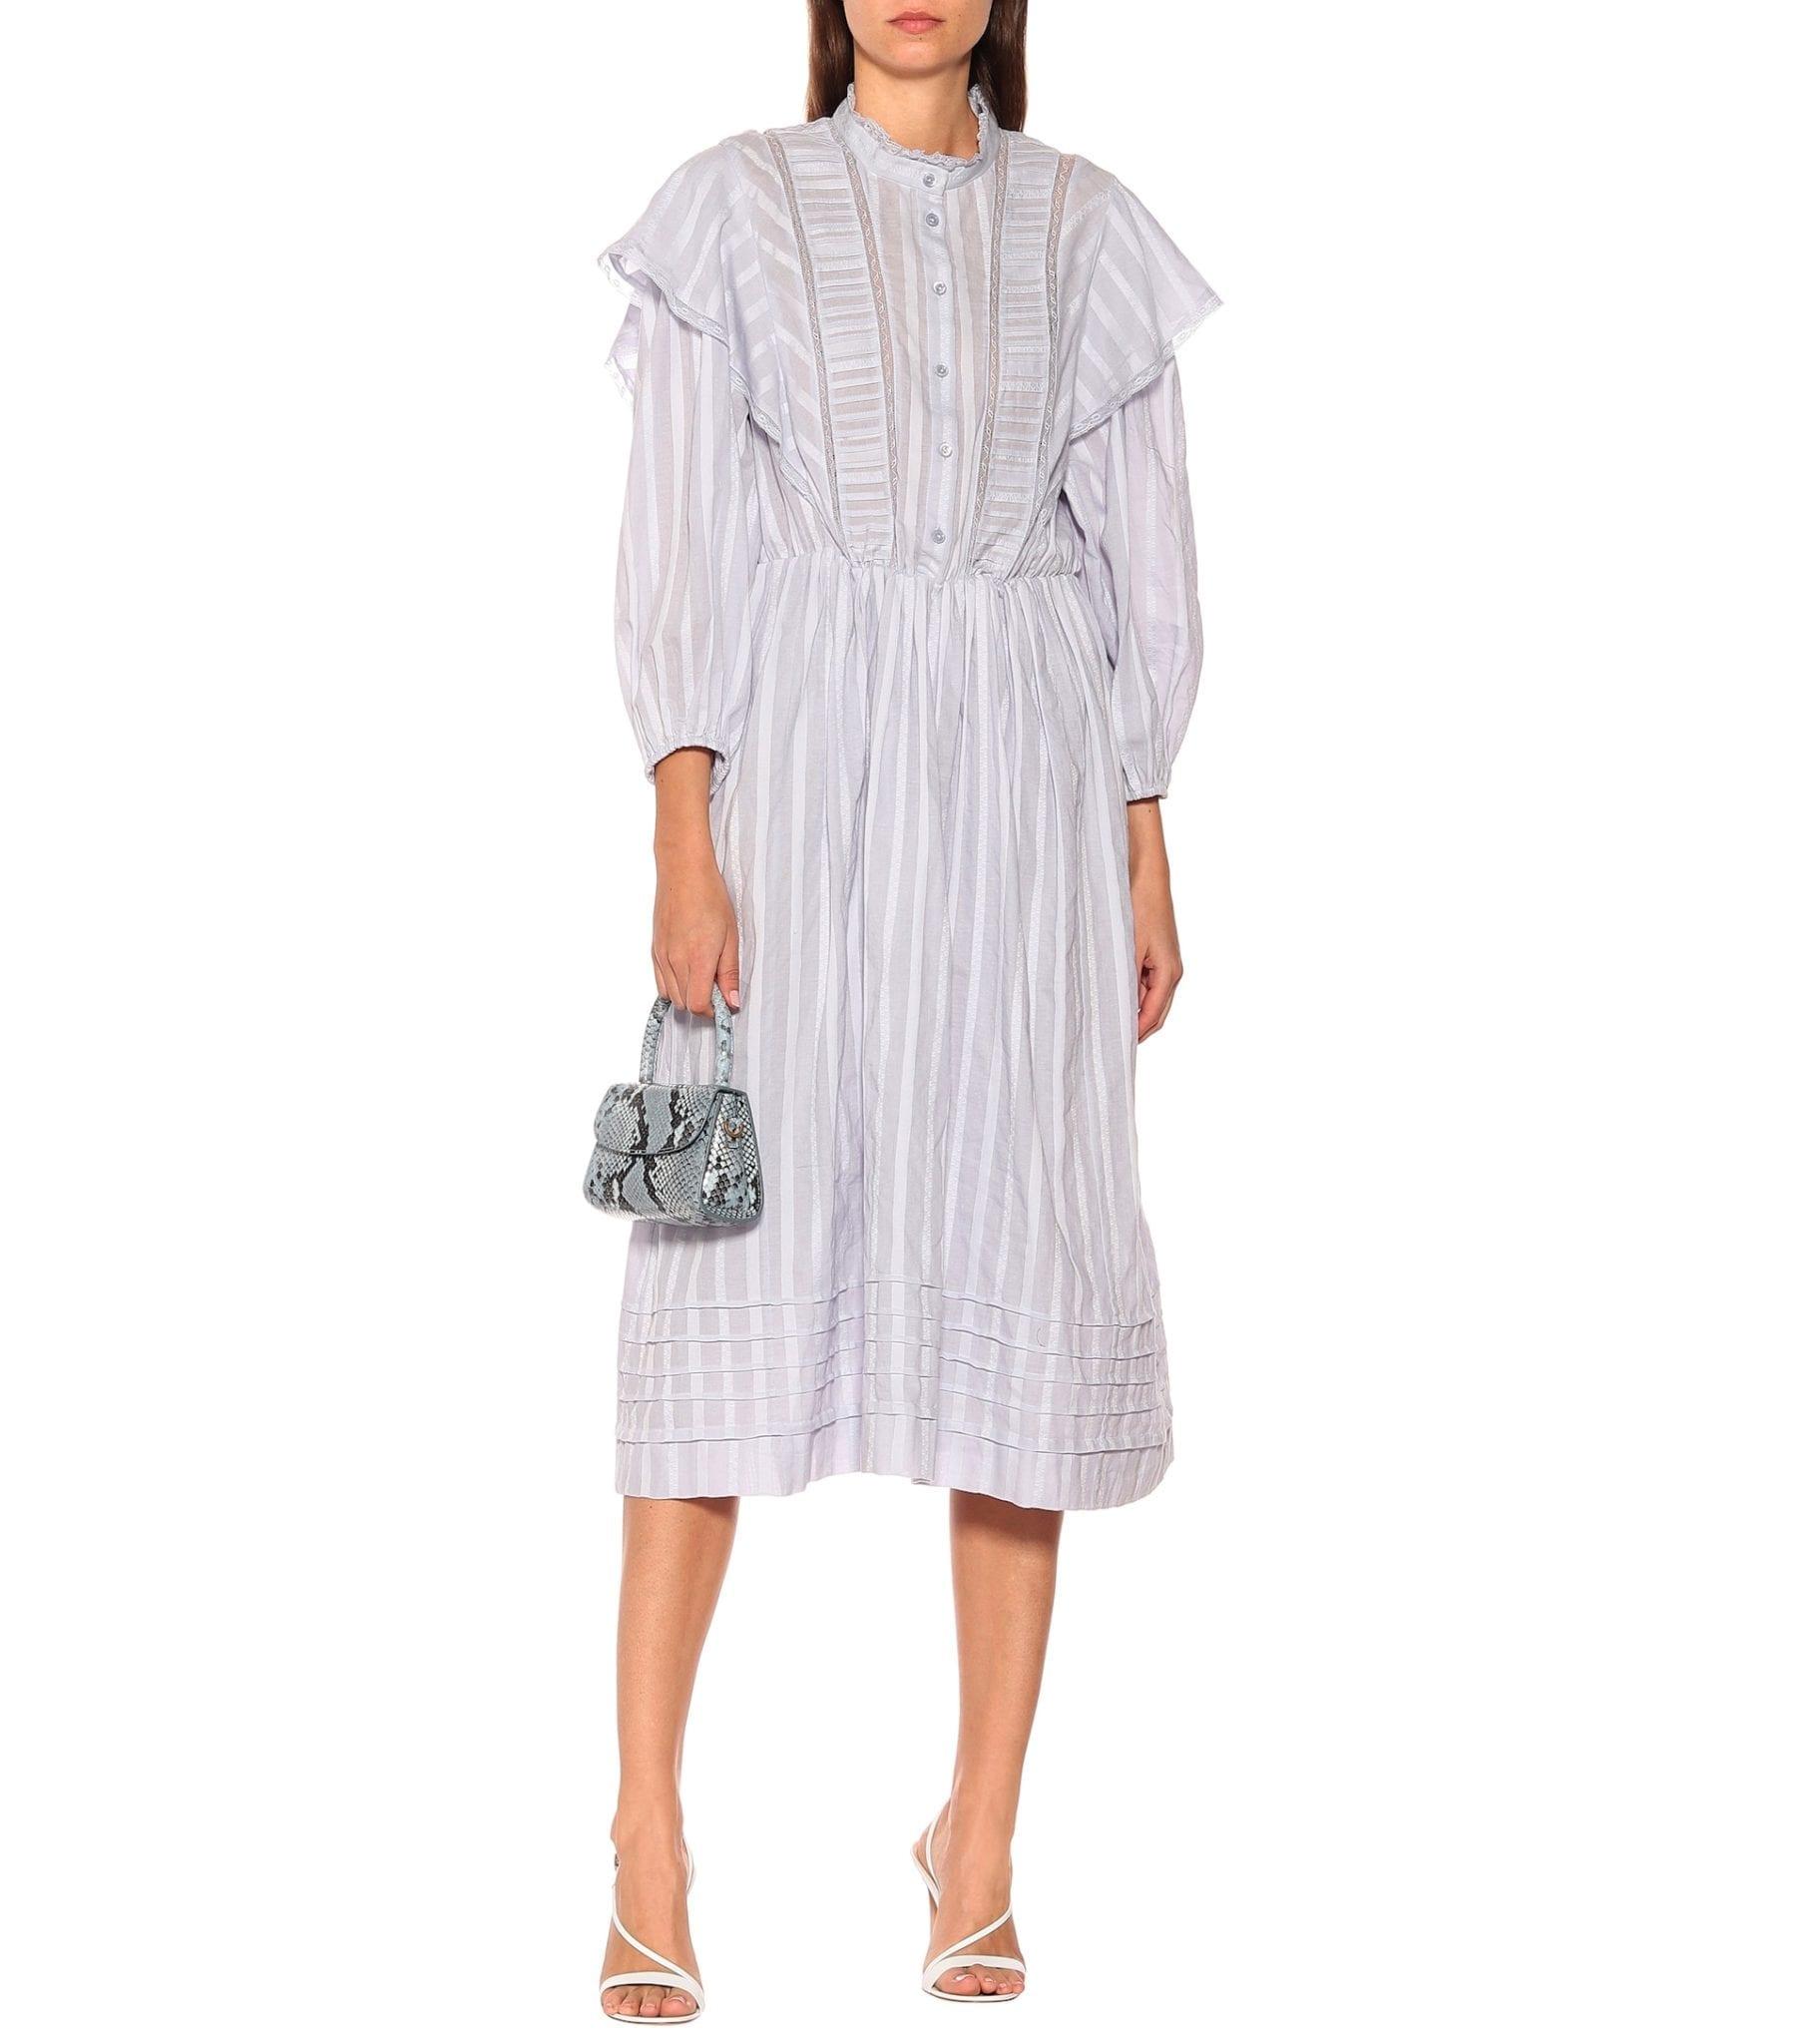 ISABEL MARANT, ÉTOILE Paolina Cotton Dress